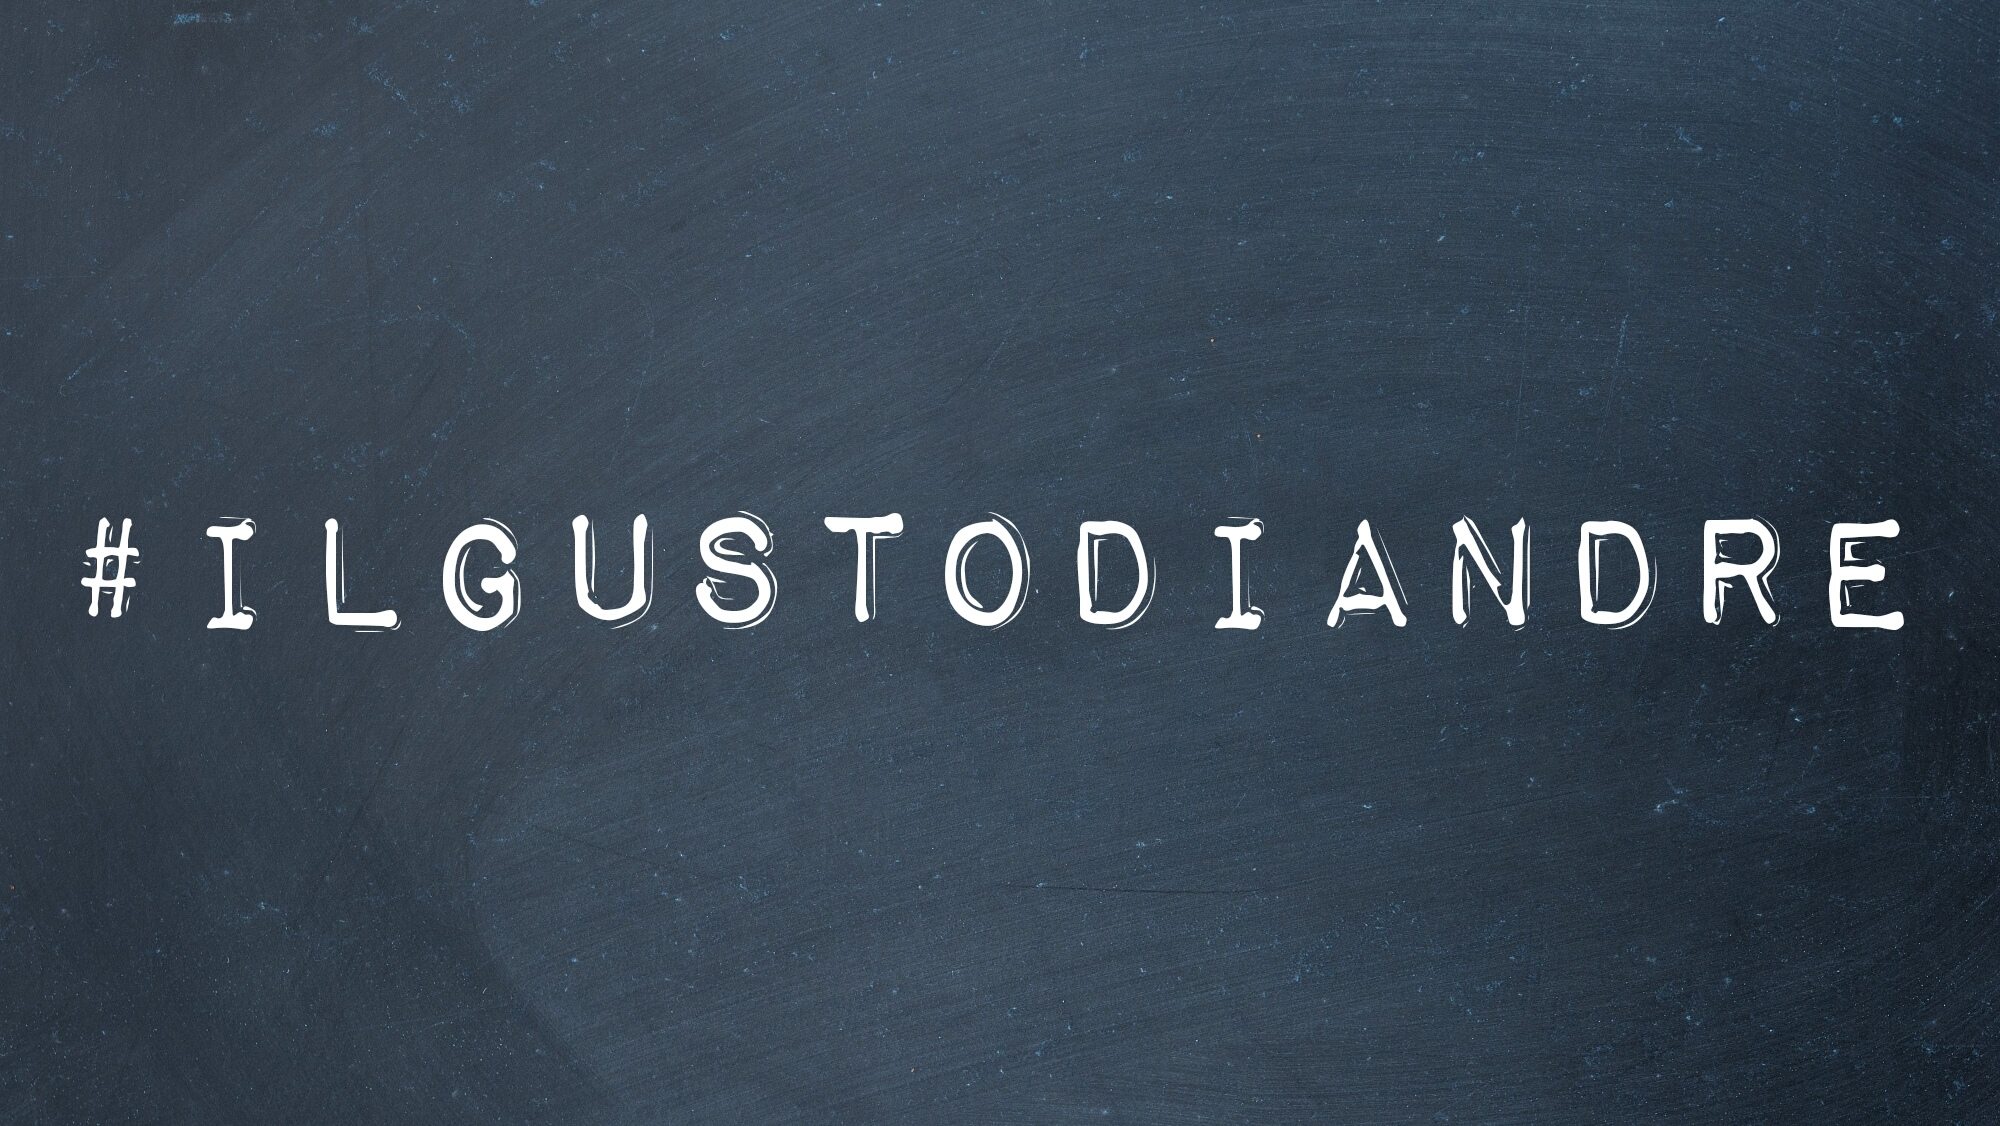 #ilgustodiandre